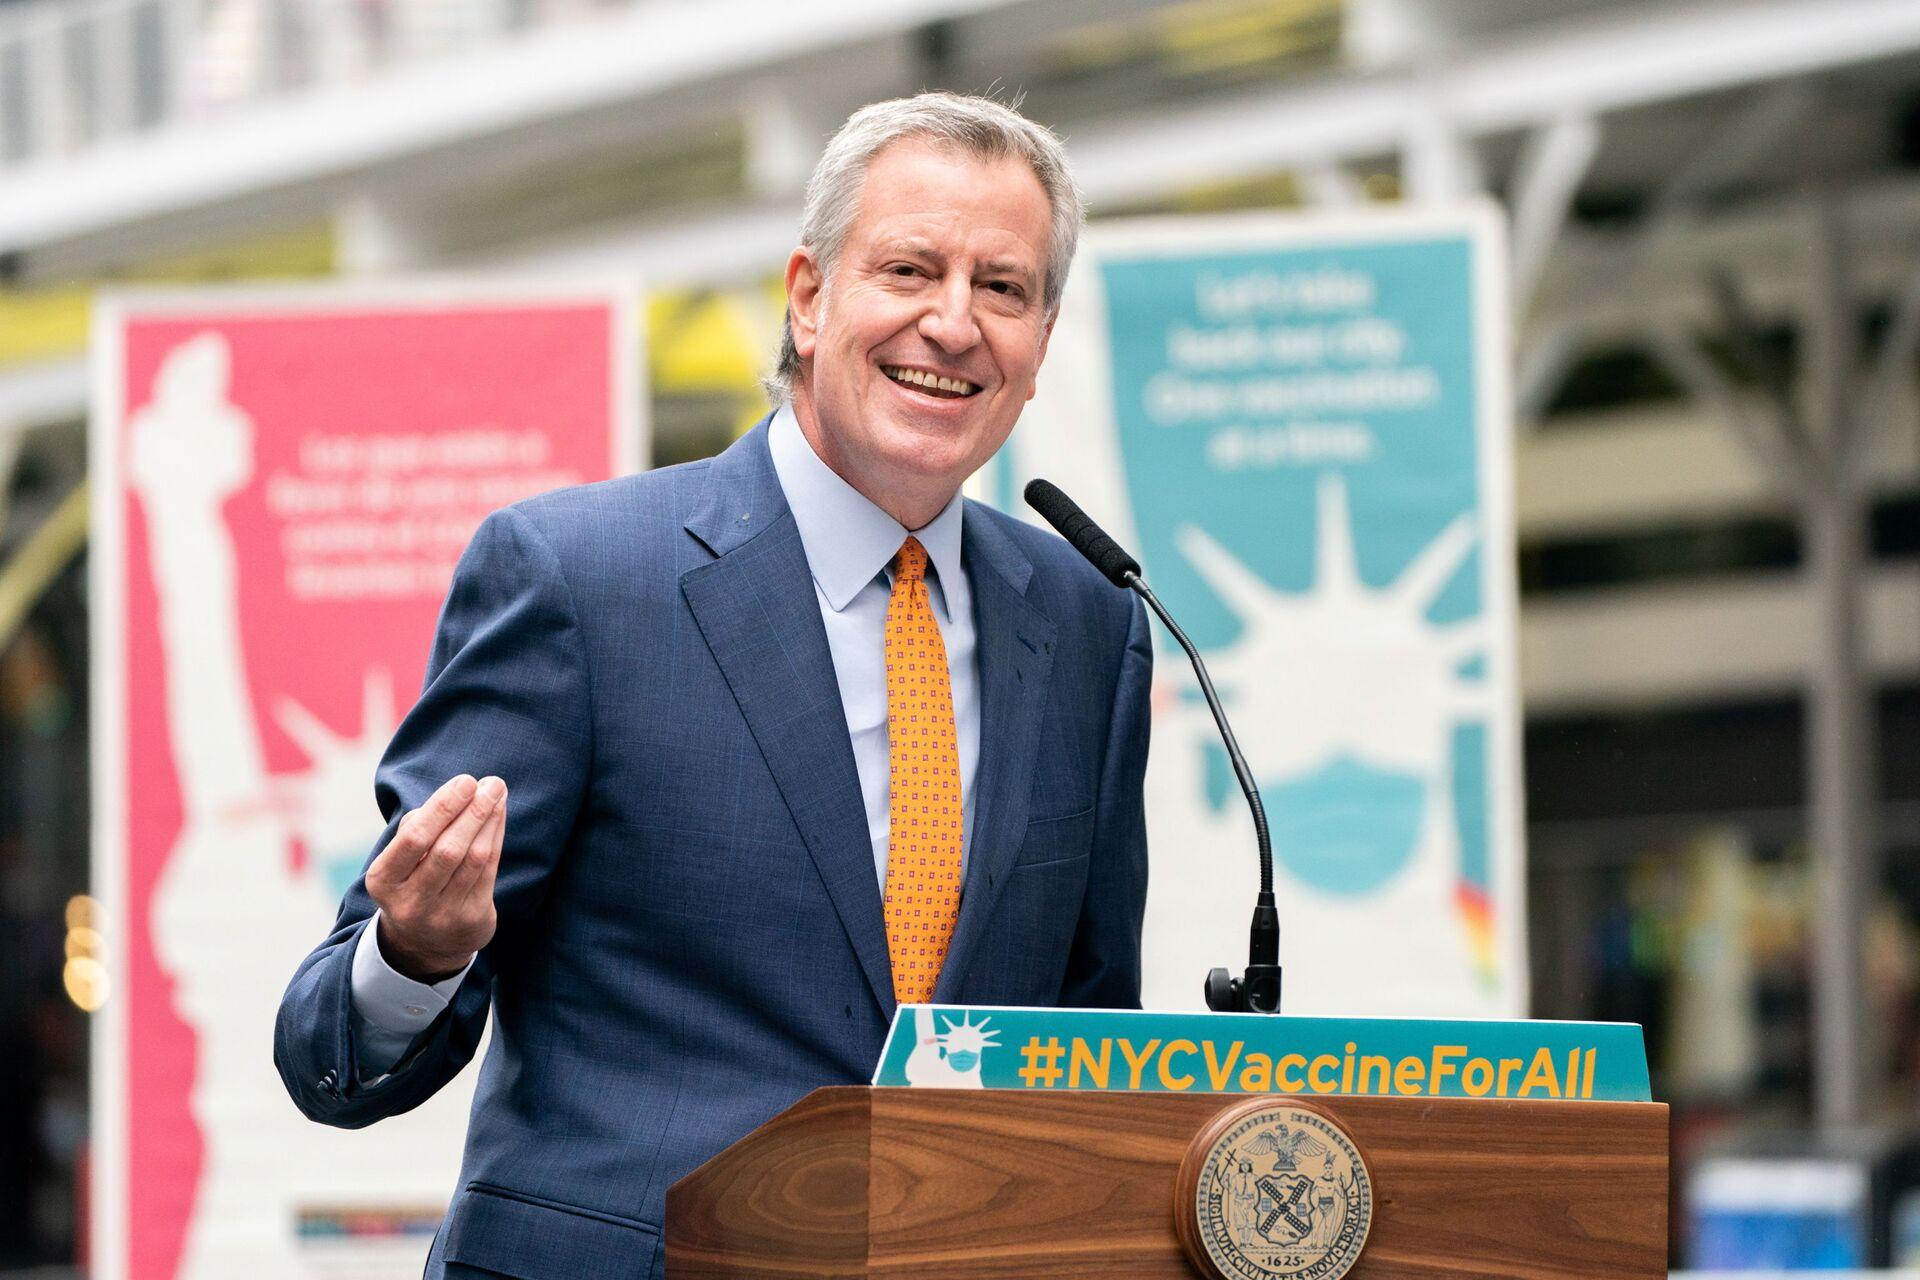 New York City Mayor Bill de Blasio speaks during the opening of the Broadway vaccination site amid coronavirus disease (COVID-19) pandemic in New York City, U.S., April 12, 2021 - Sputnik International, 1920, 07.09.2021